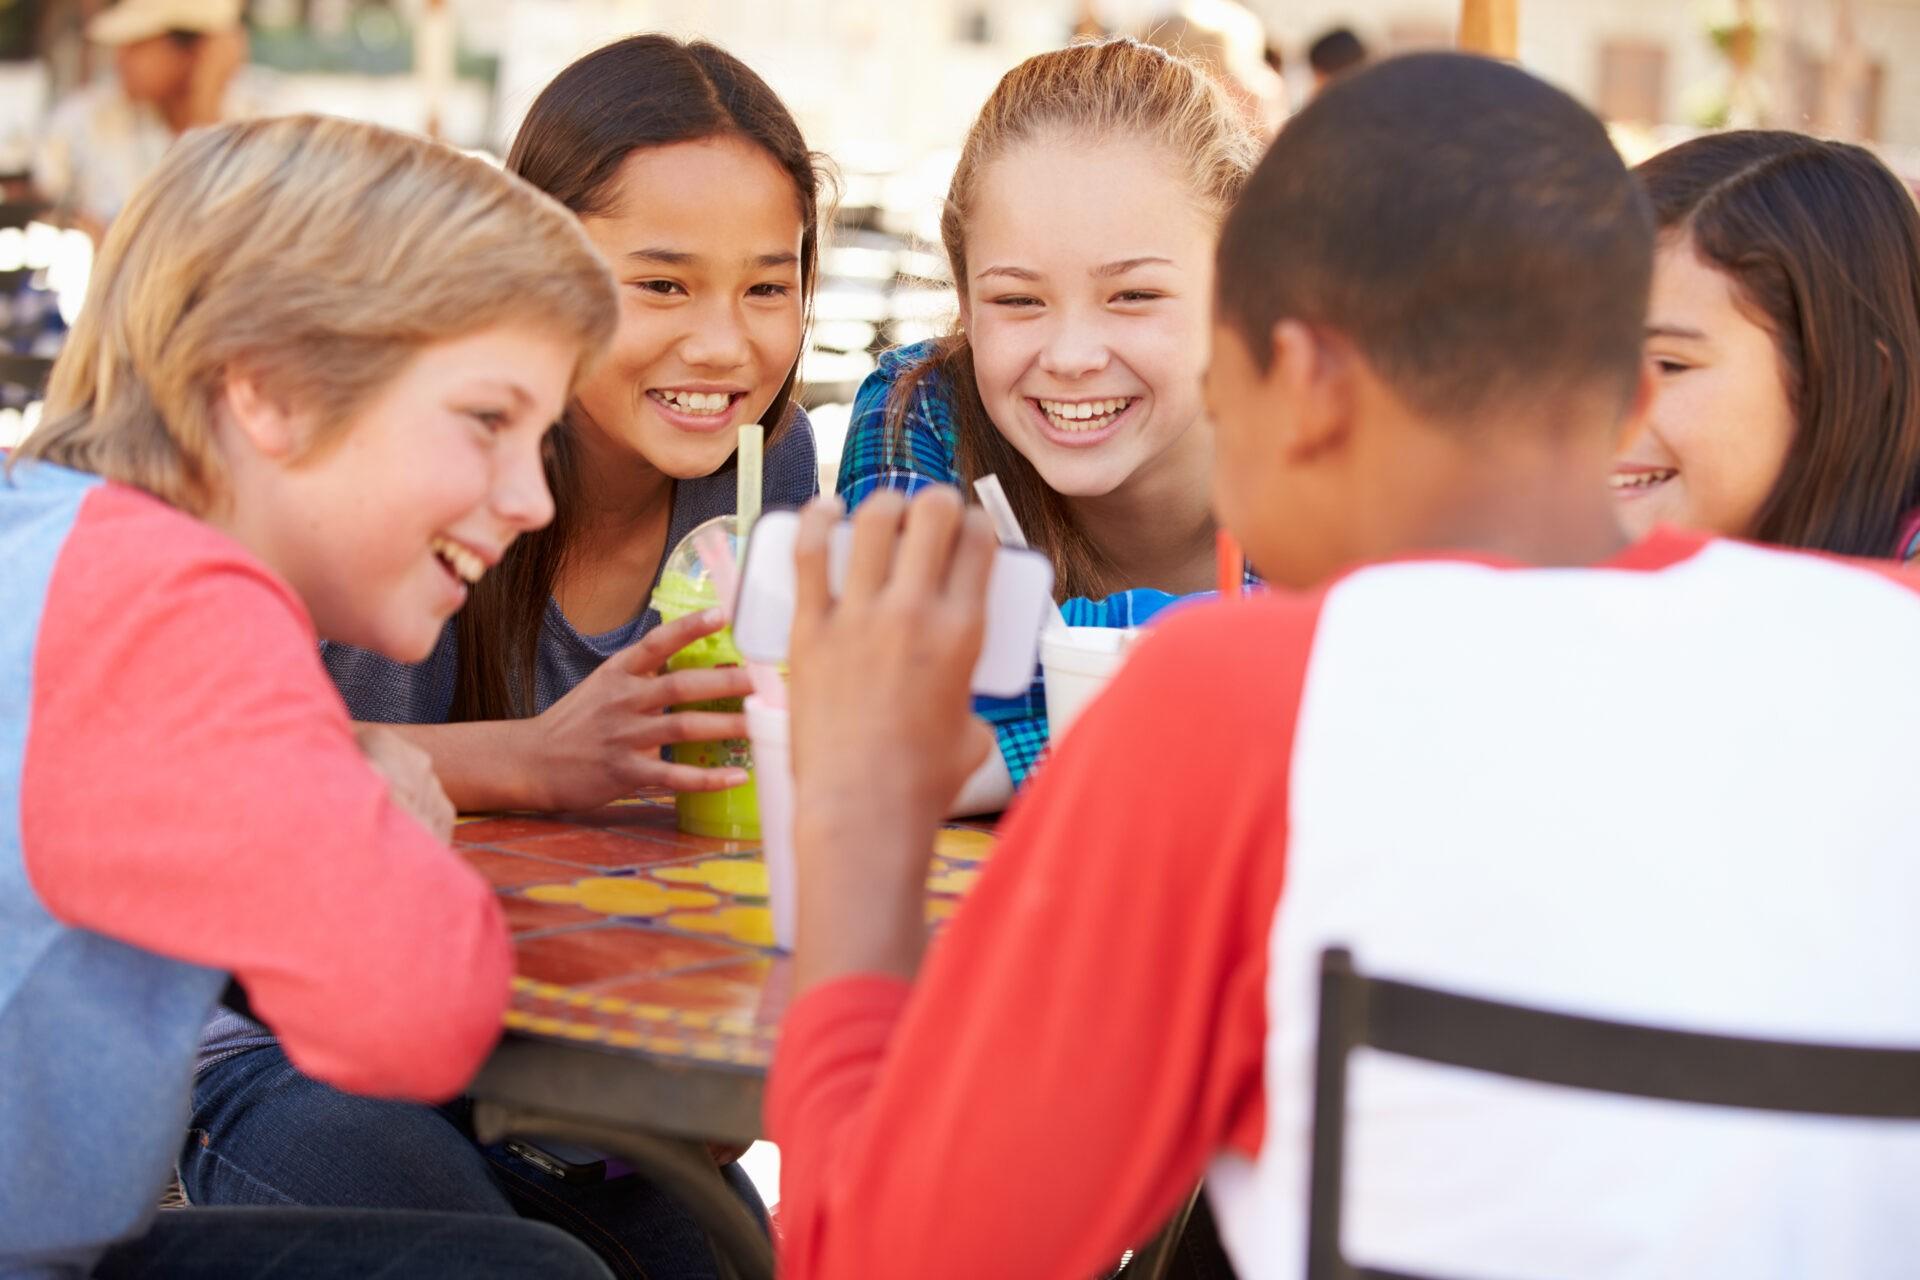 children having lunch laughing